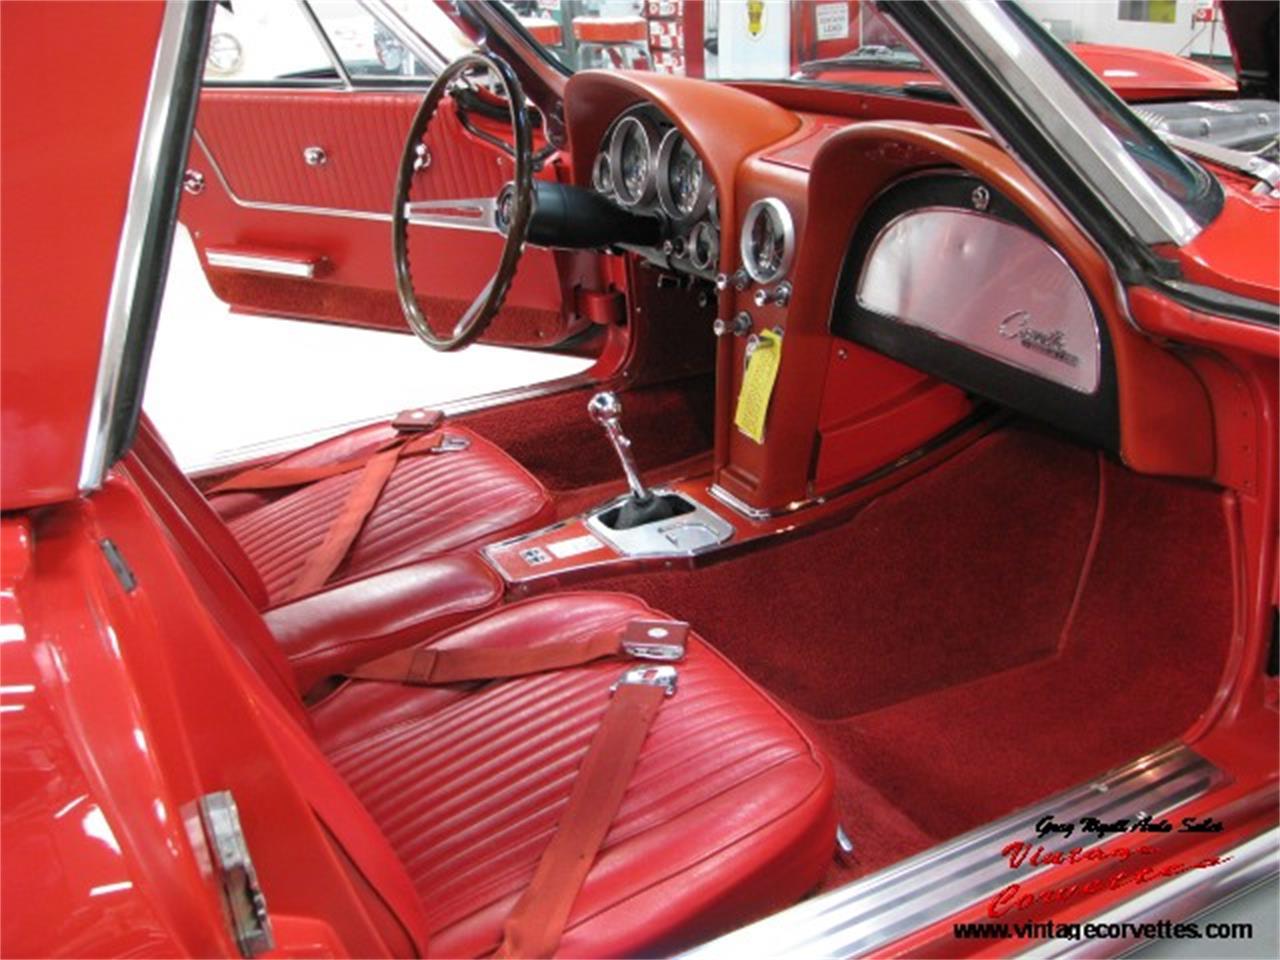 1964 Chevrolet Corvette (CC-1414779) for sale in Summerville, Georgia